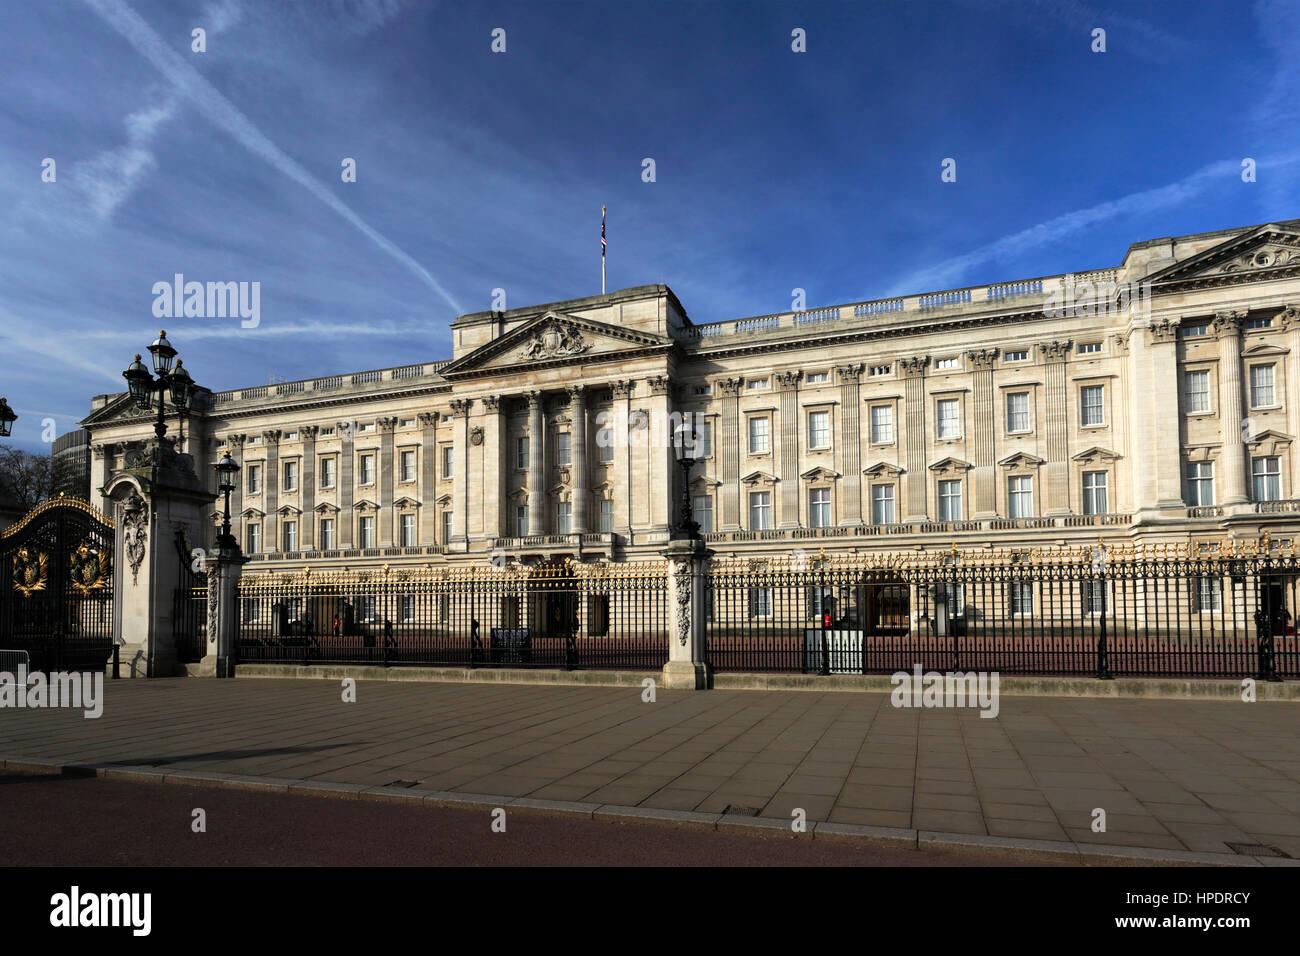 Sommer Blick auf die Fassade des Buckingham Palace, St. James, London, England, Großbritannien Stockbild